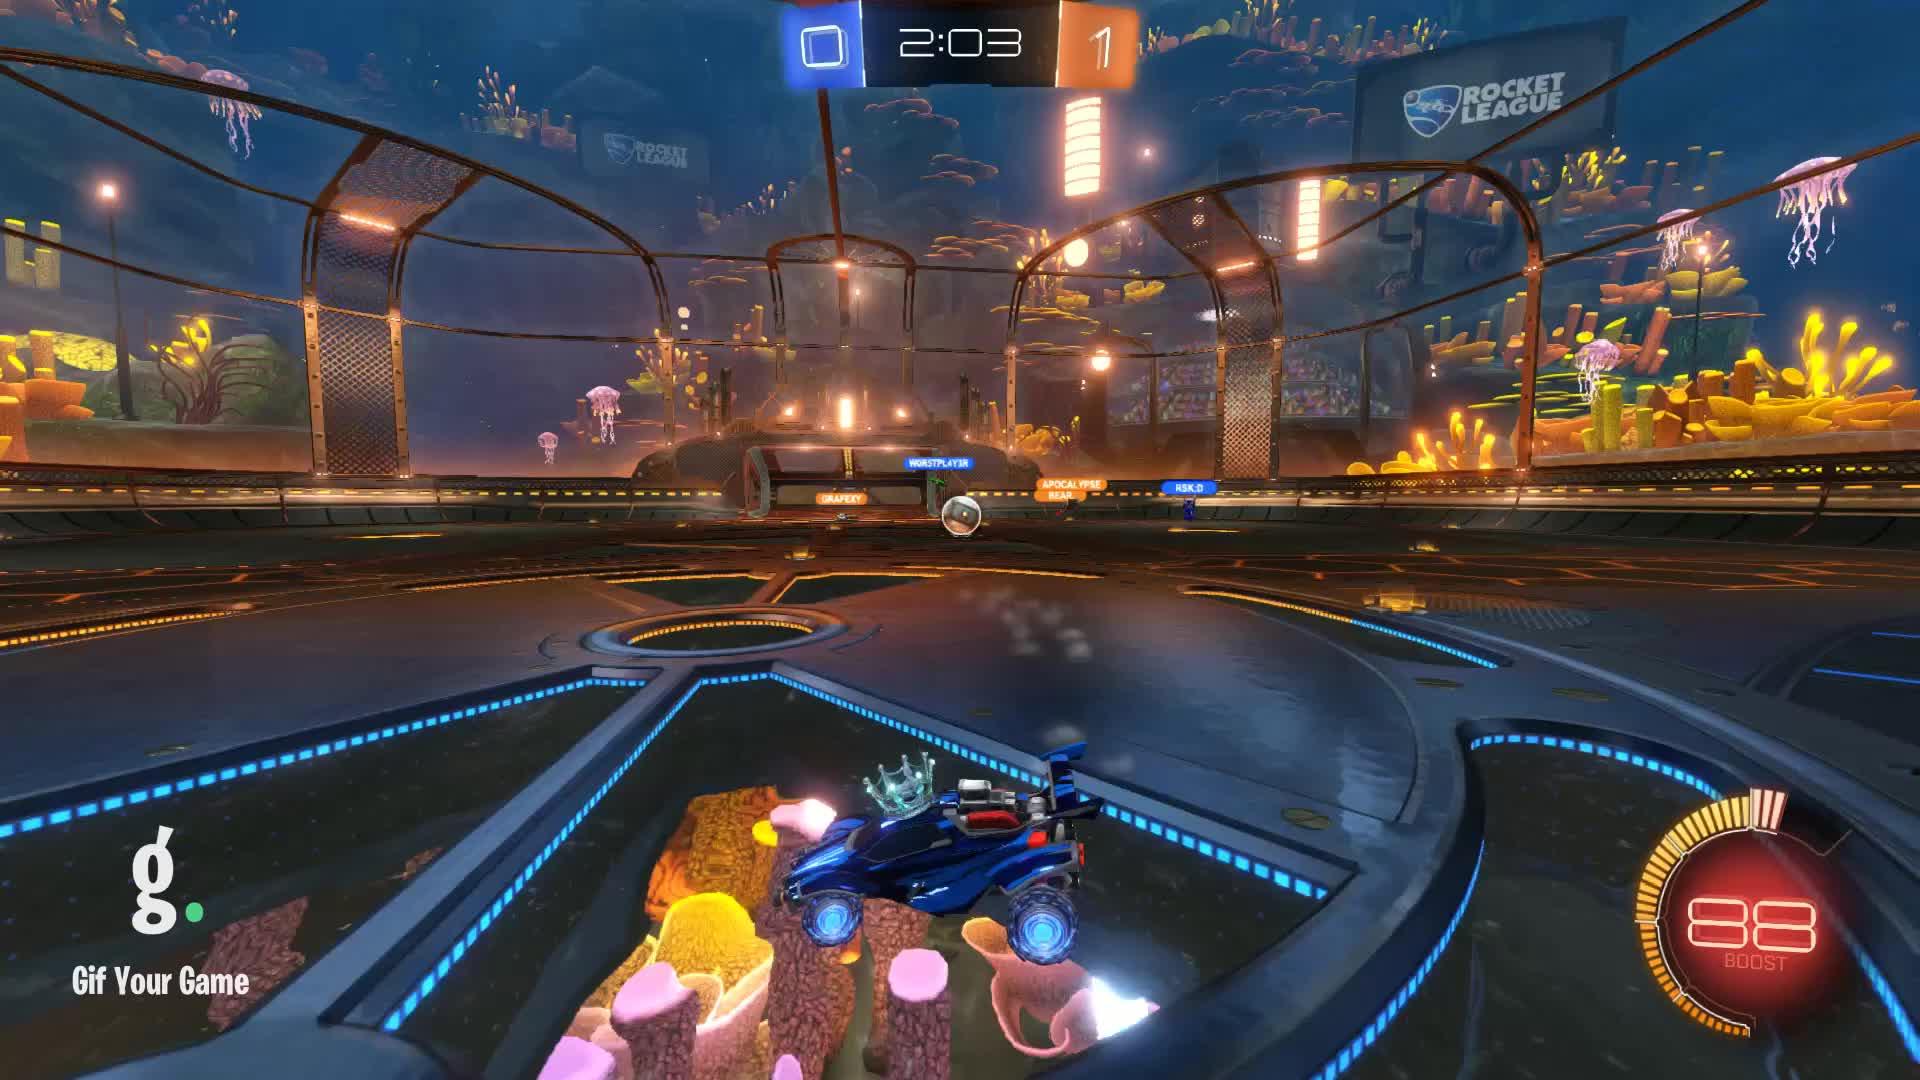 Gif Your Game, GifYourGame, Goal, MITO, Rocket League, RocketLeague, Goal 2: MITO GIFs